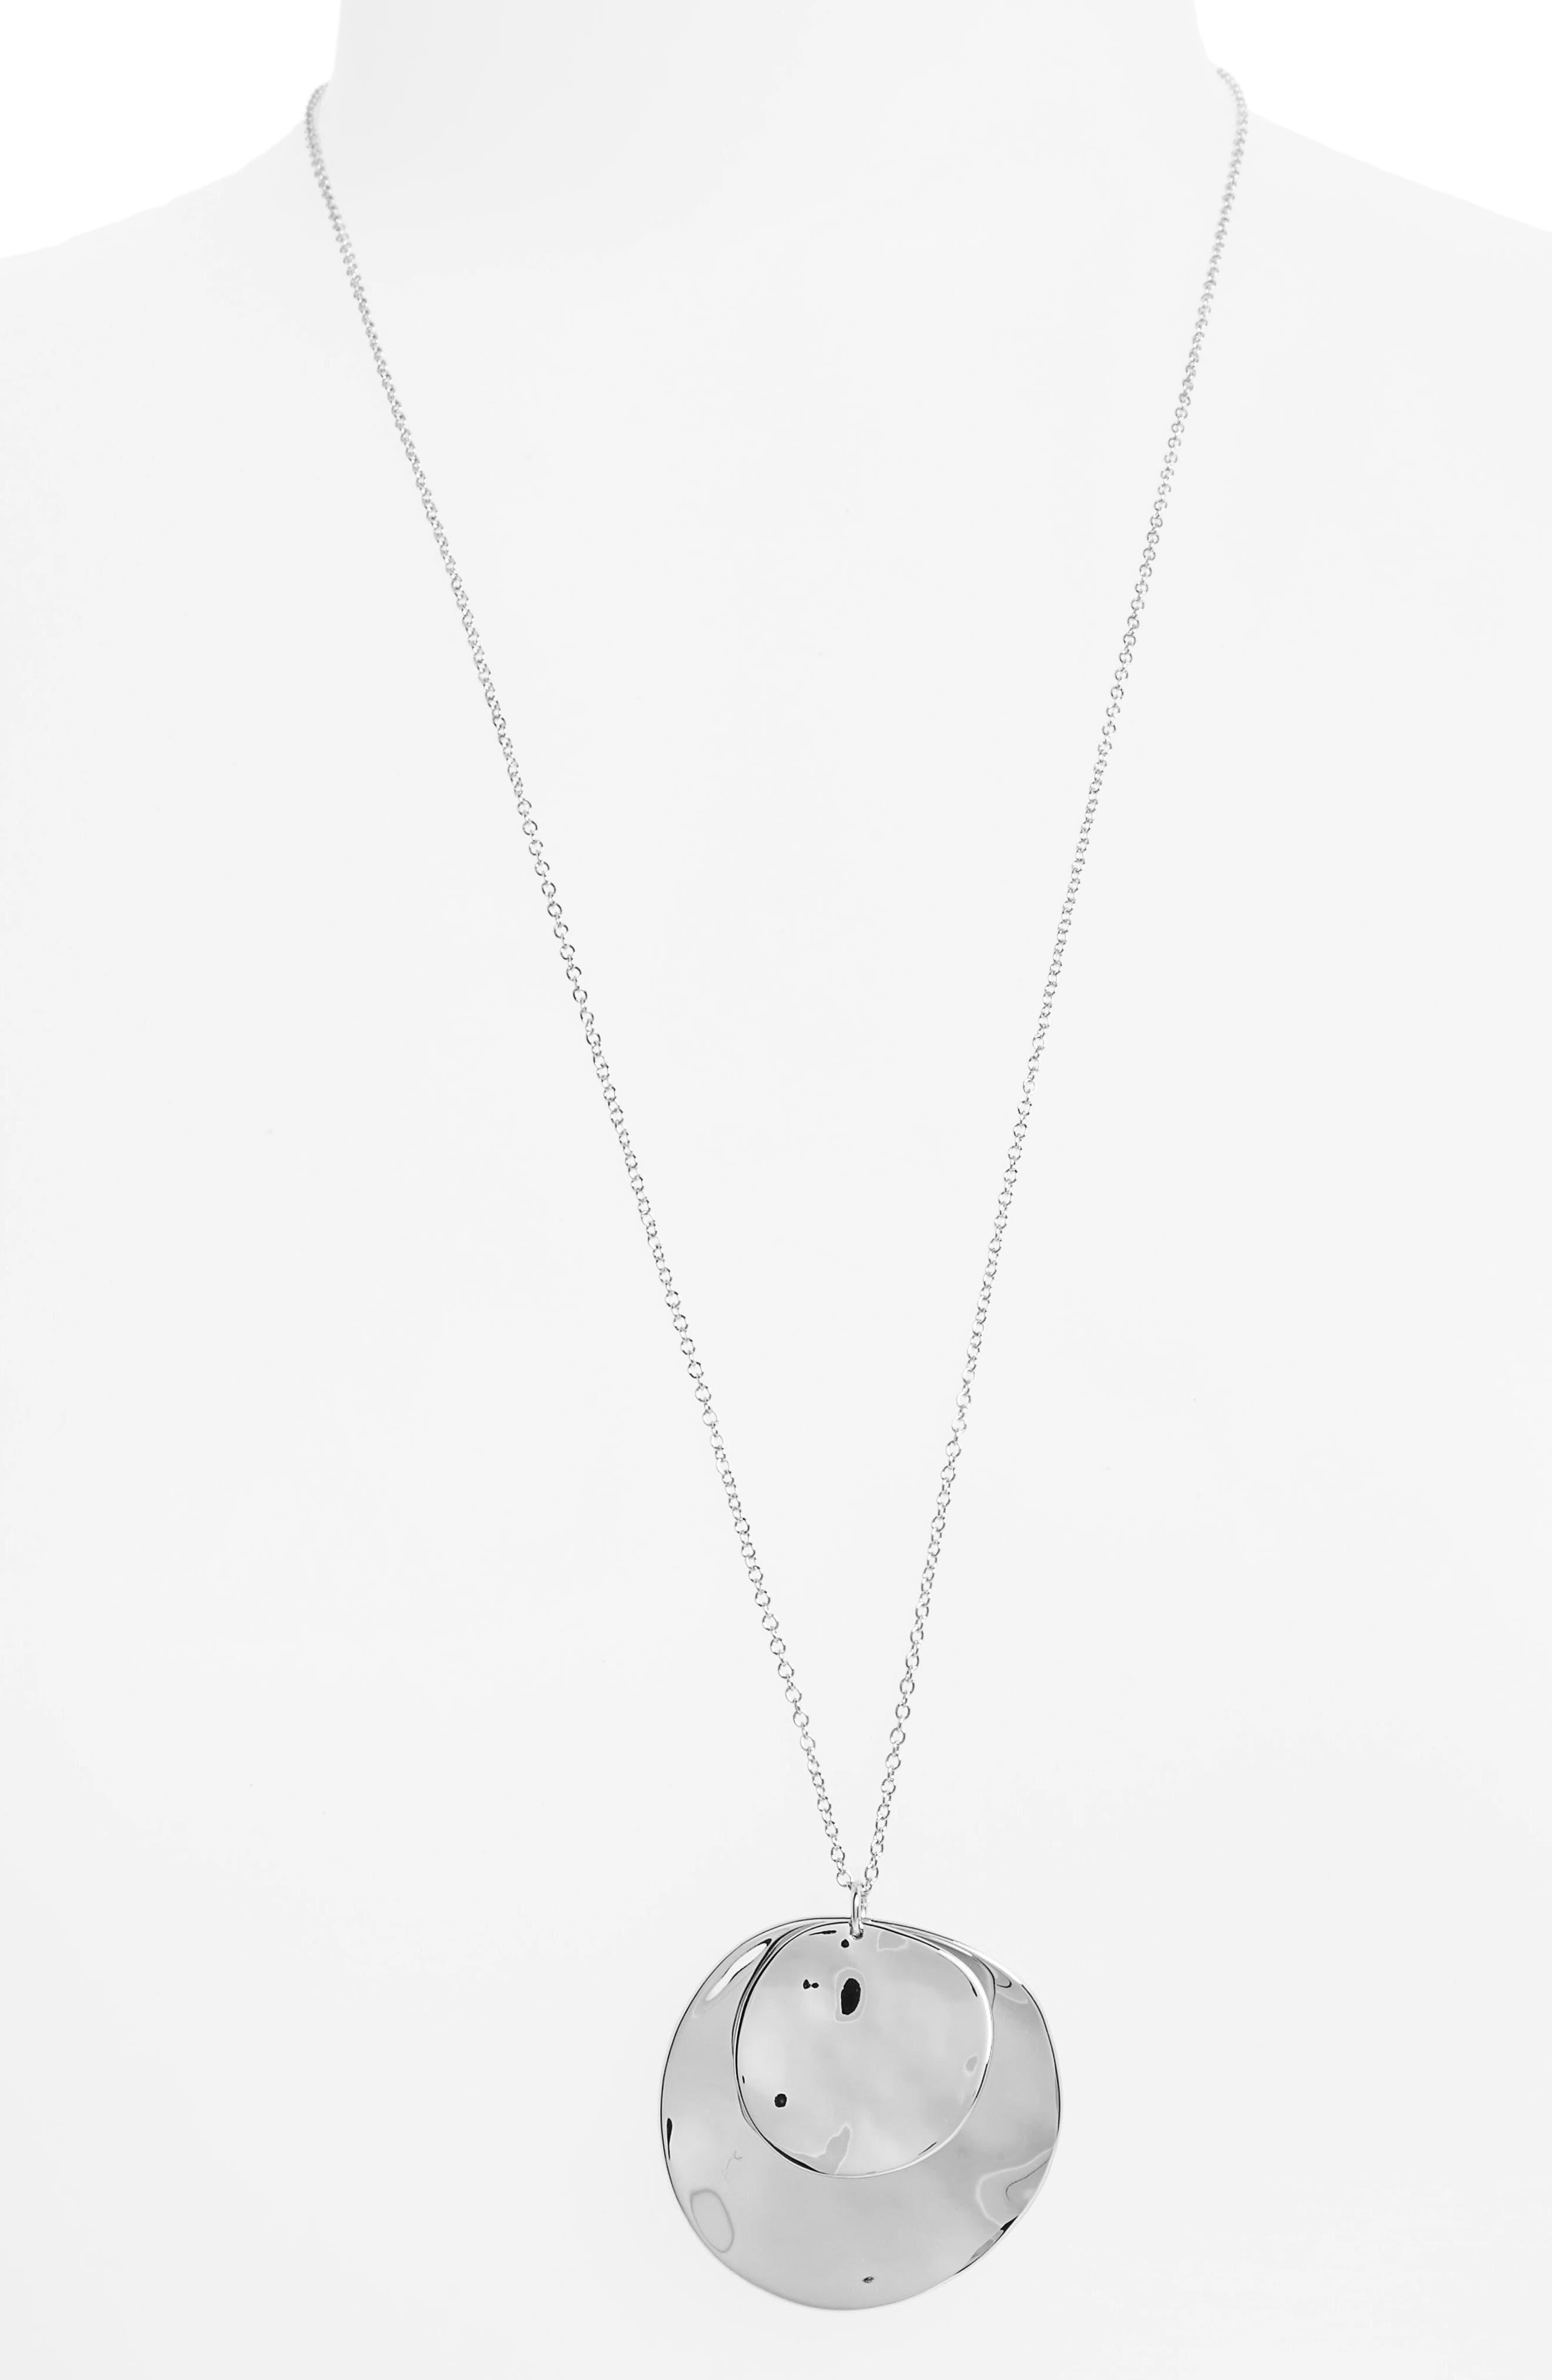 Main Image - gorjana Chloe Long Cluster Pendant Necklace